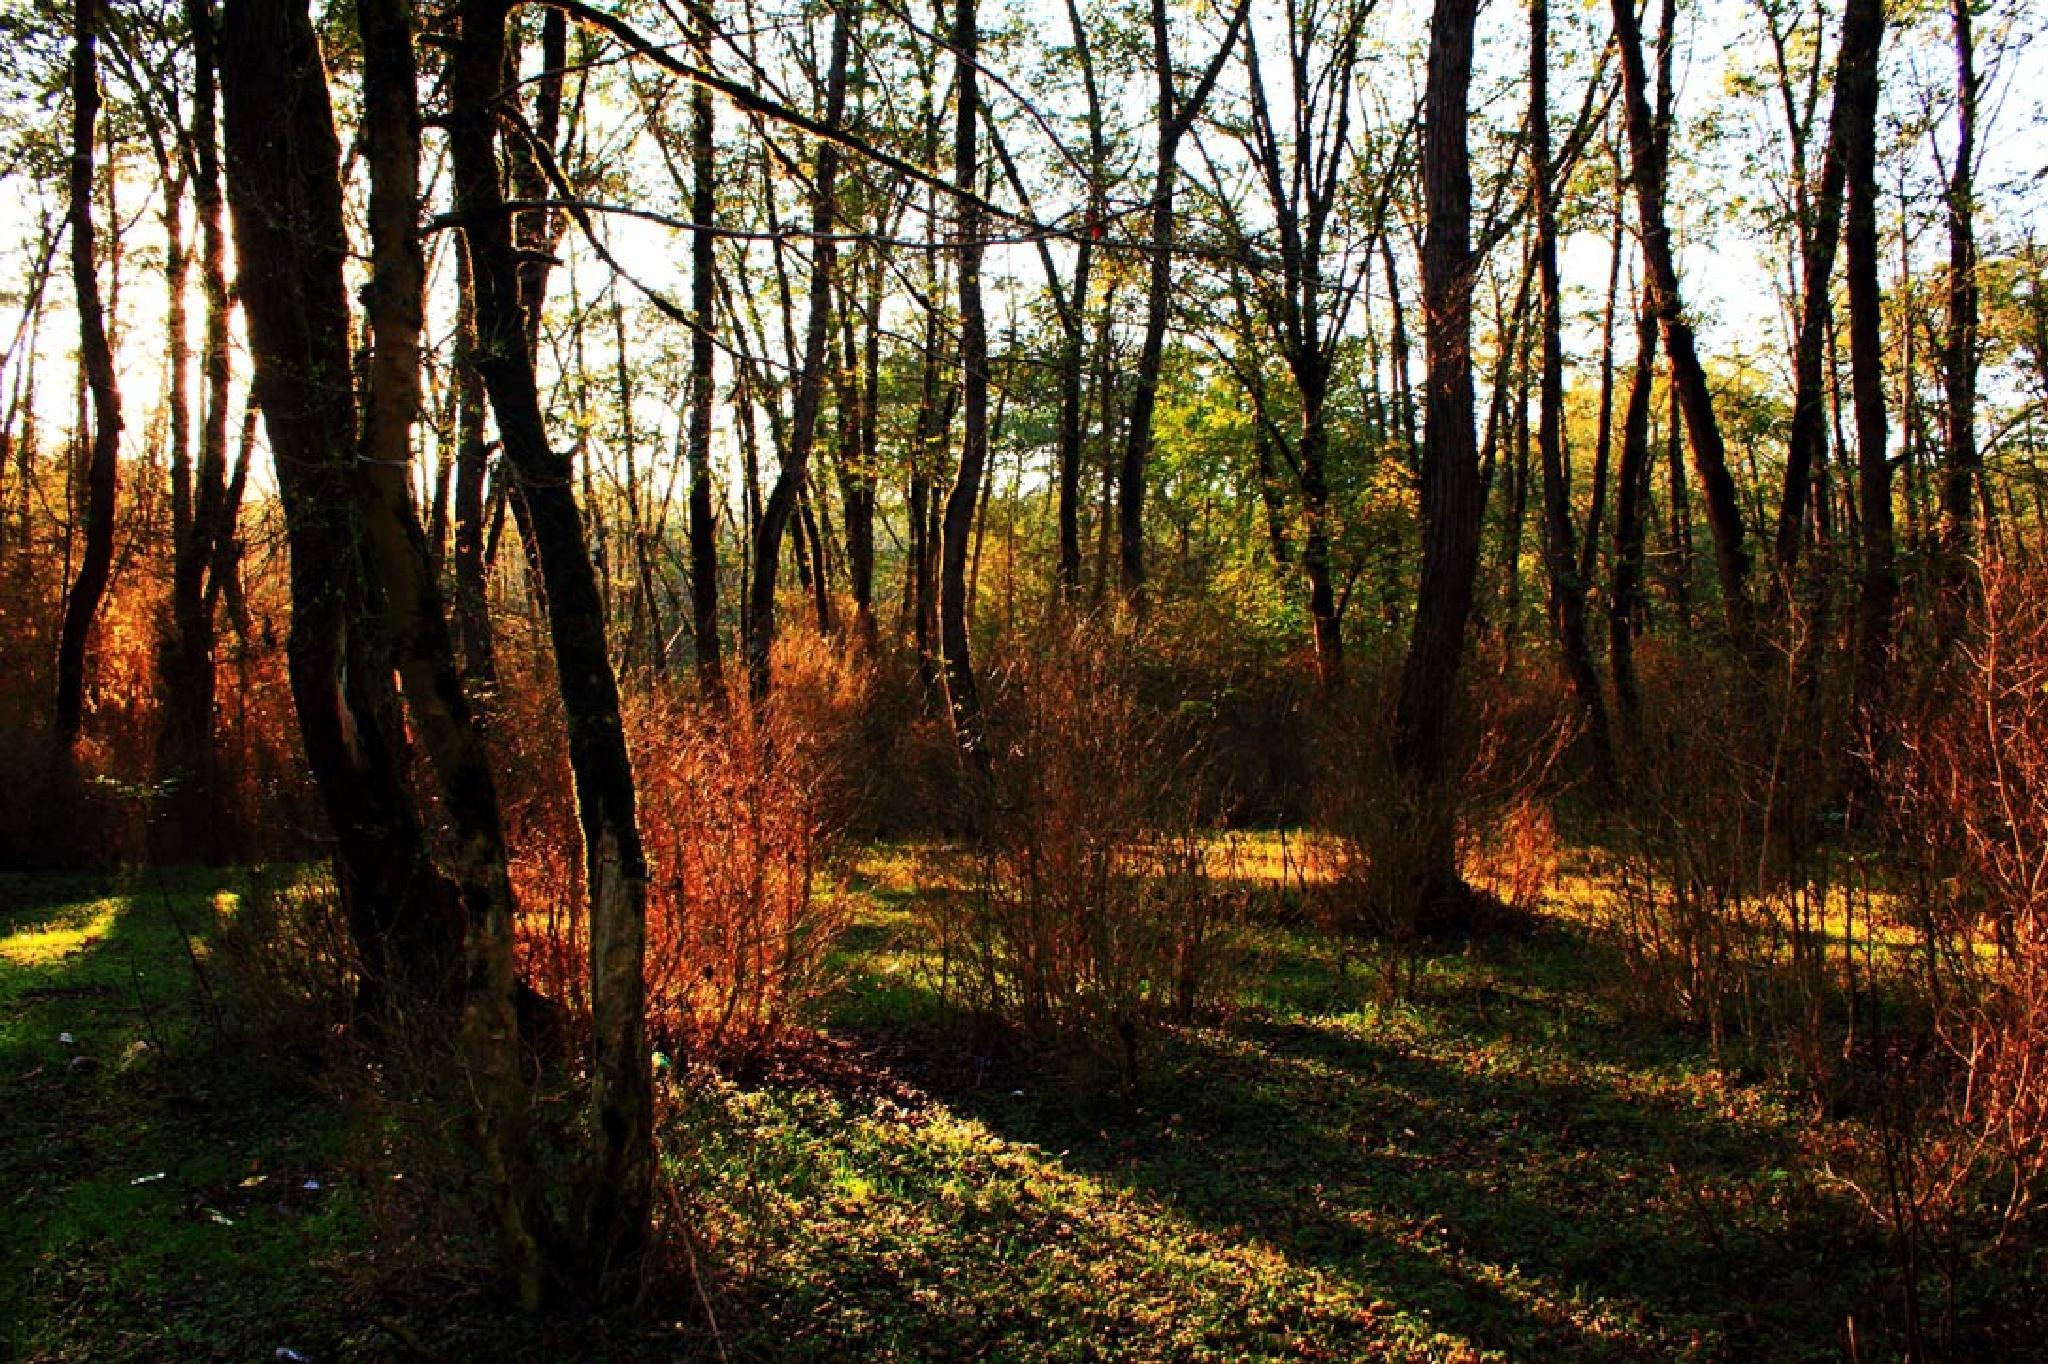 Jungle, Lights and Shadows by M. Reza babagoli